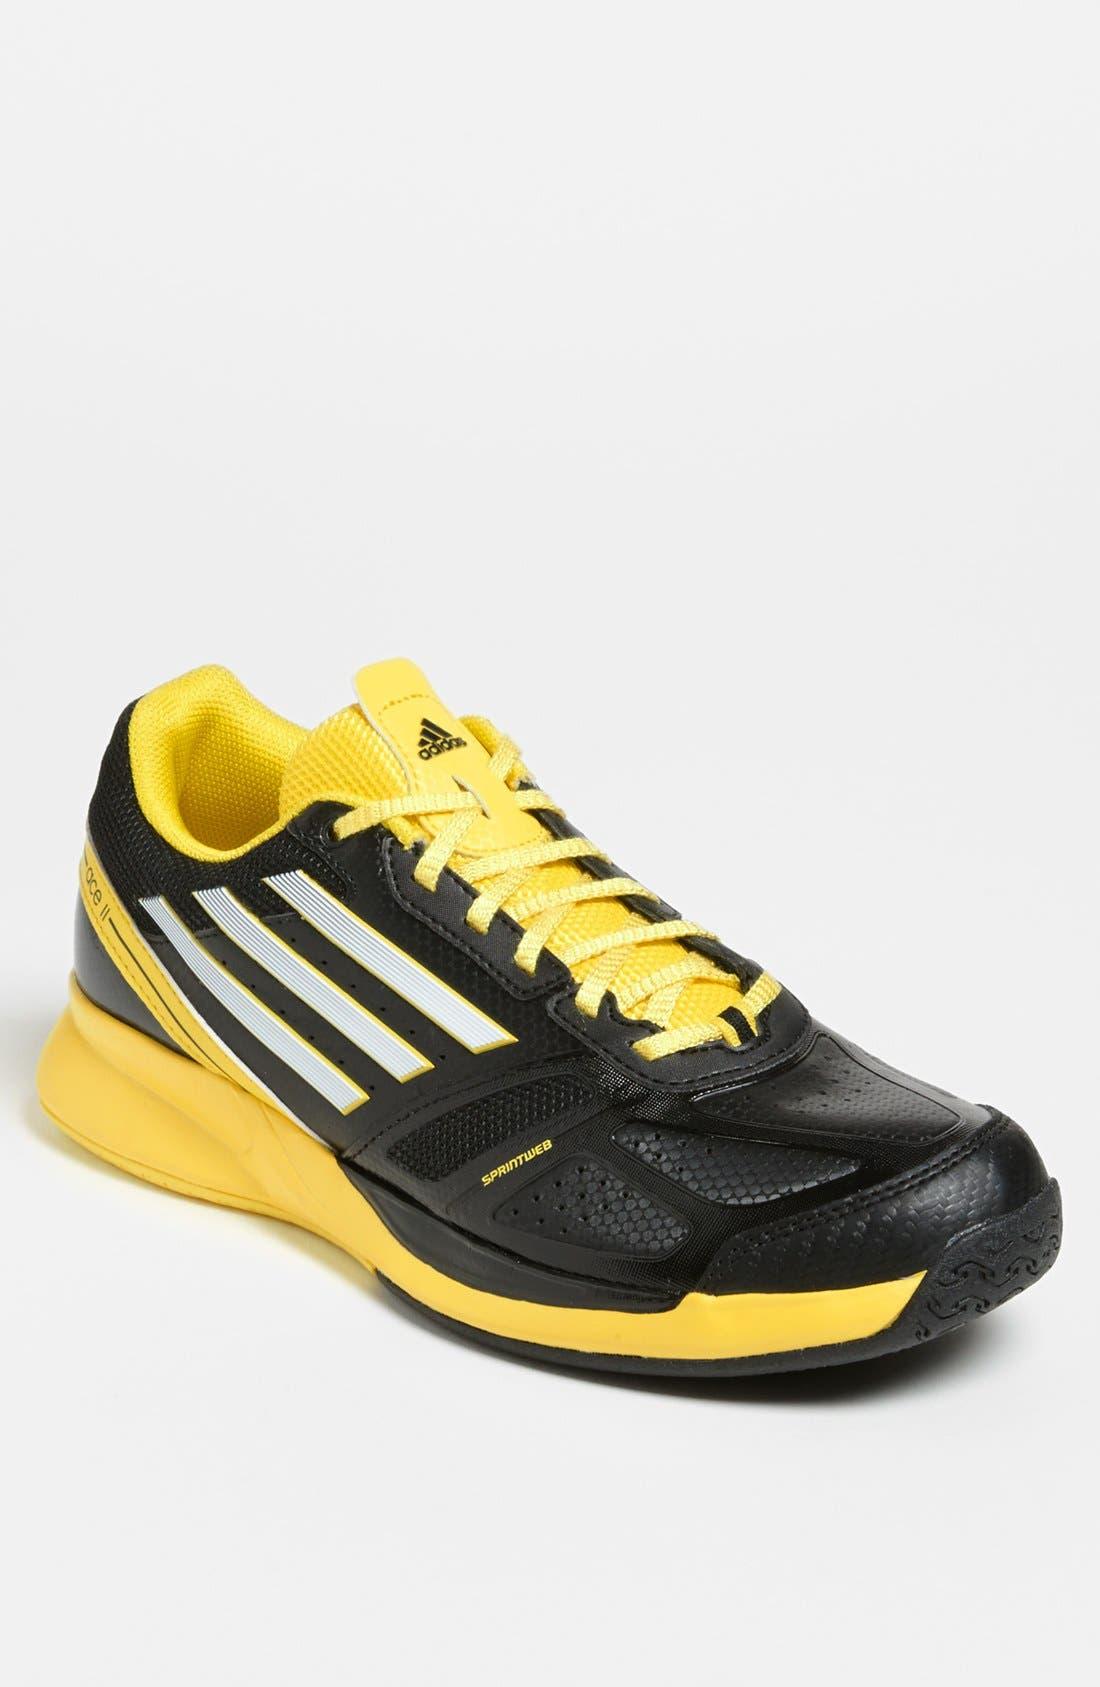 Main Image - adidas 'adiZero Ace II' Tennis Shoe (Men)